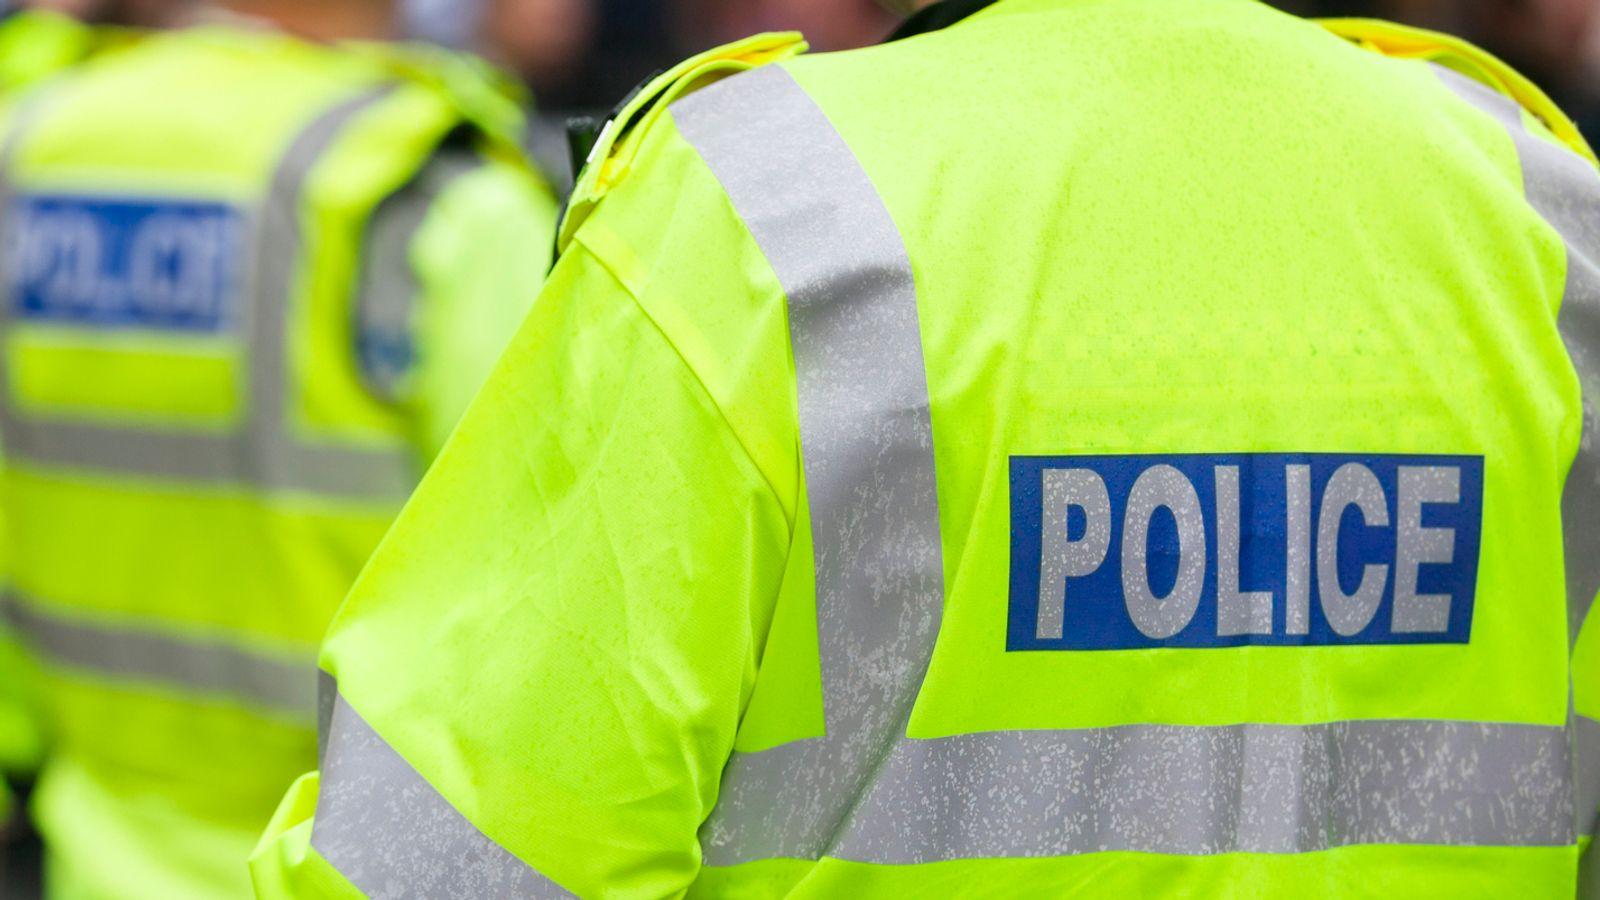 Three injured after incident involving ride at Fudstock festival in Cumbria